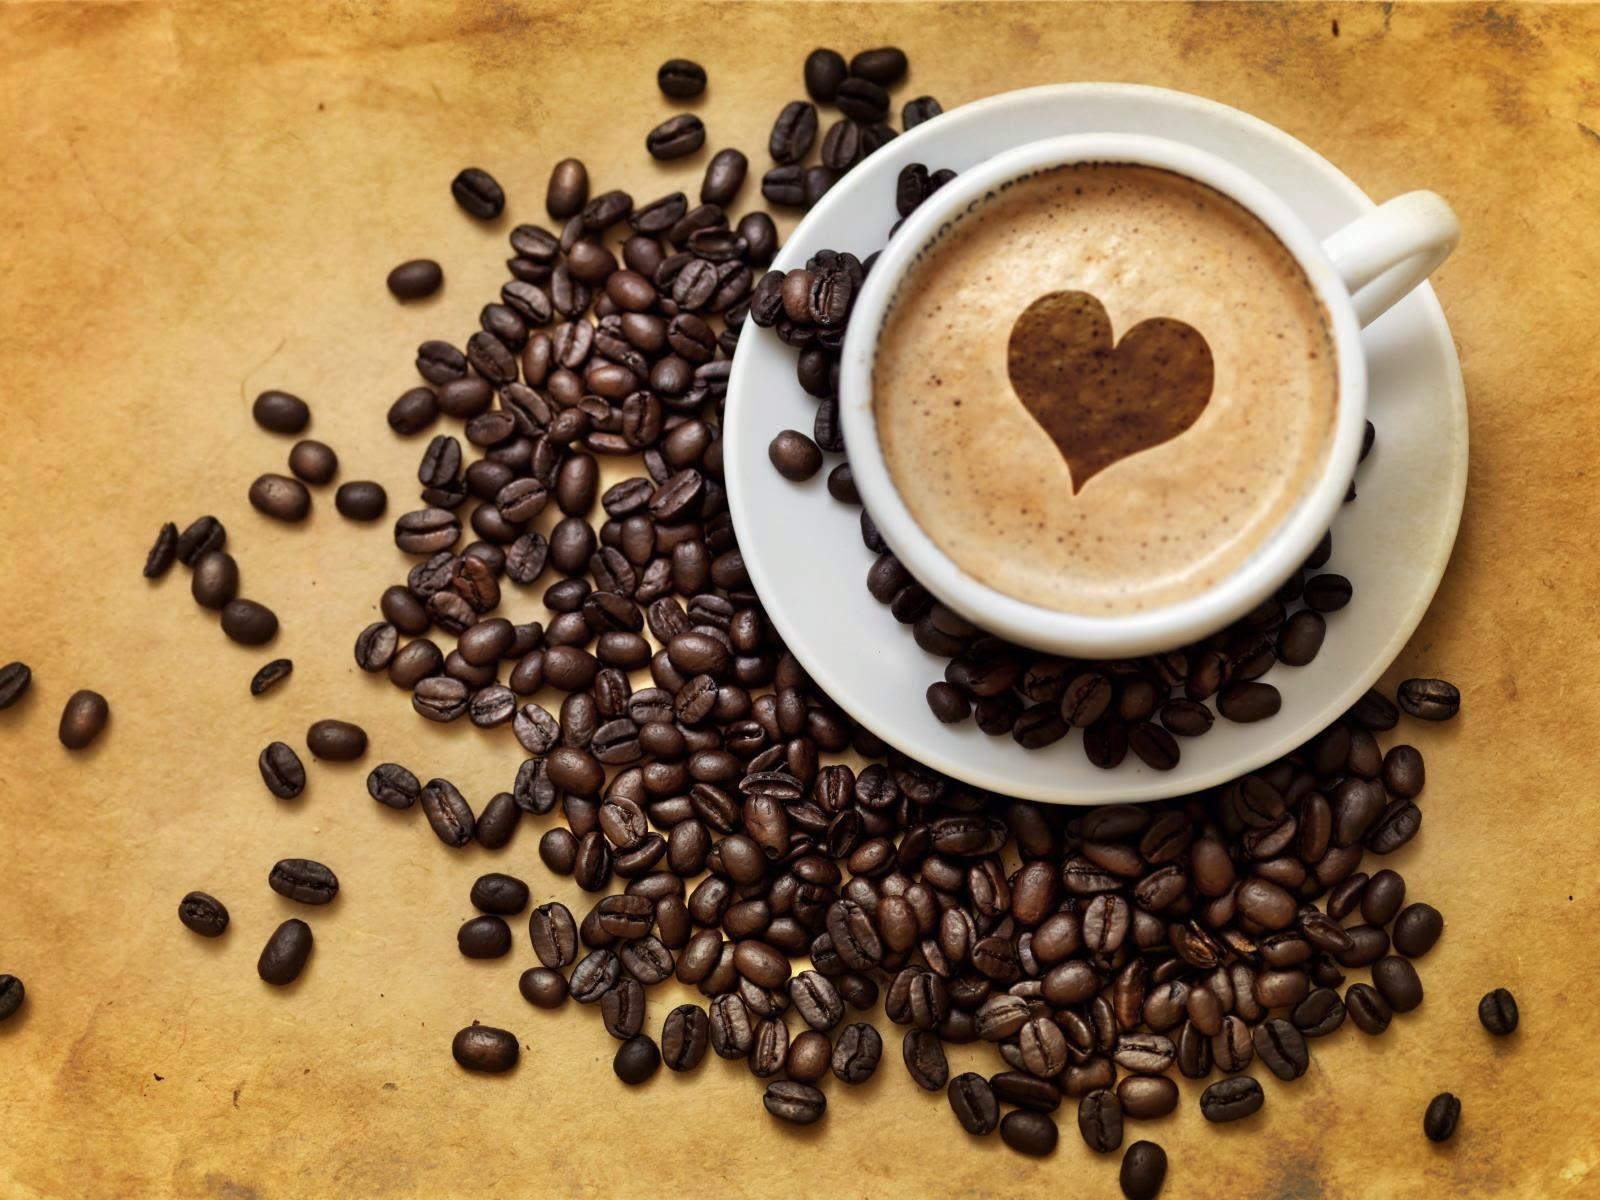 Caf%C3%A9_coffeeonekz_almaty_colombia.jp